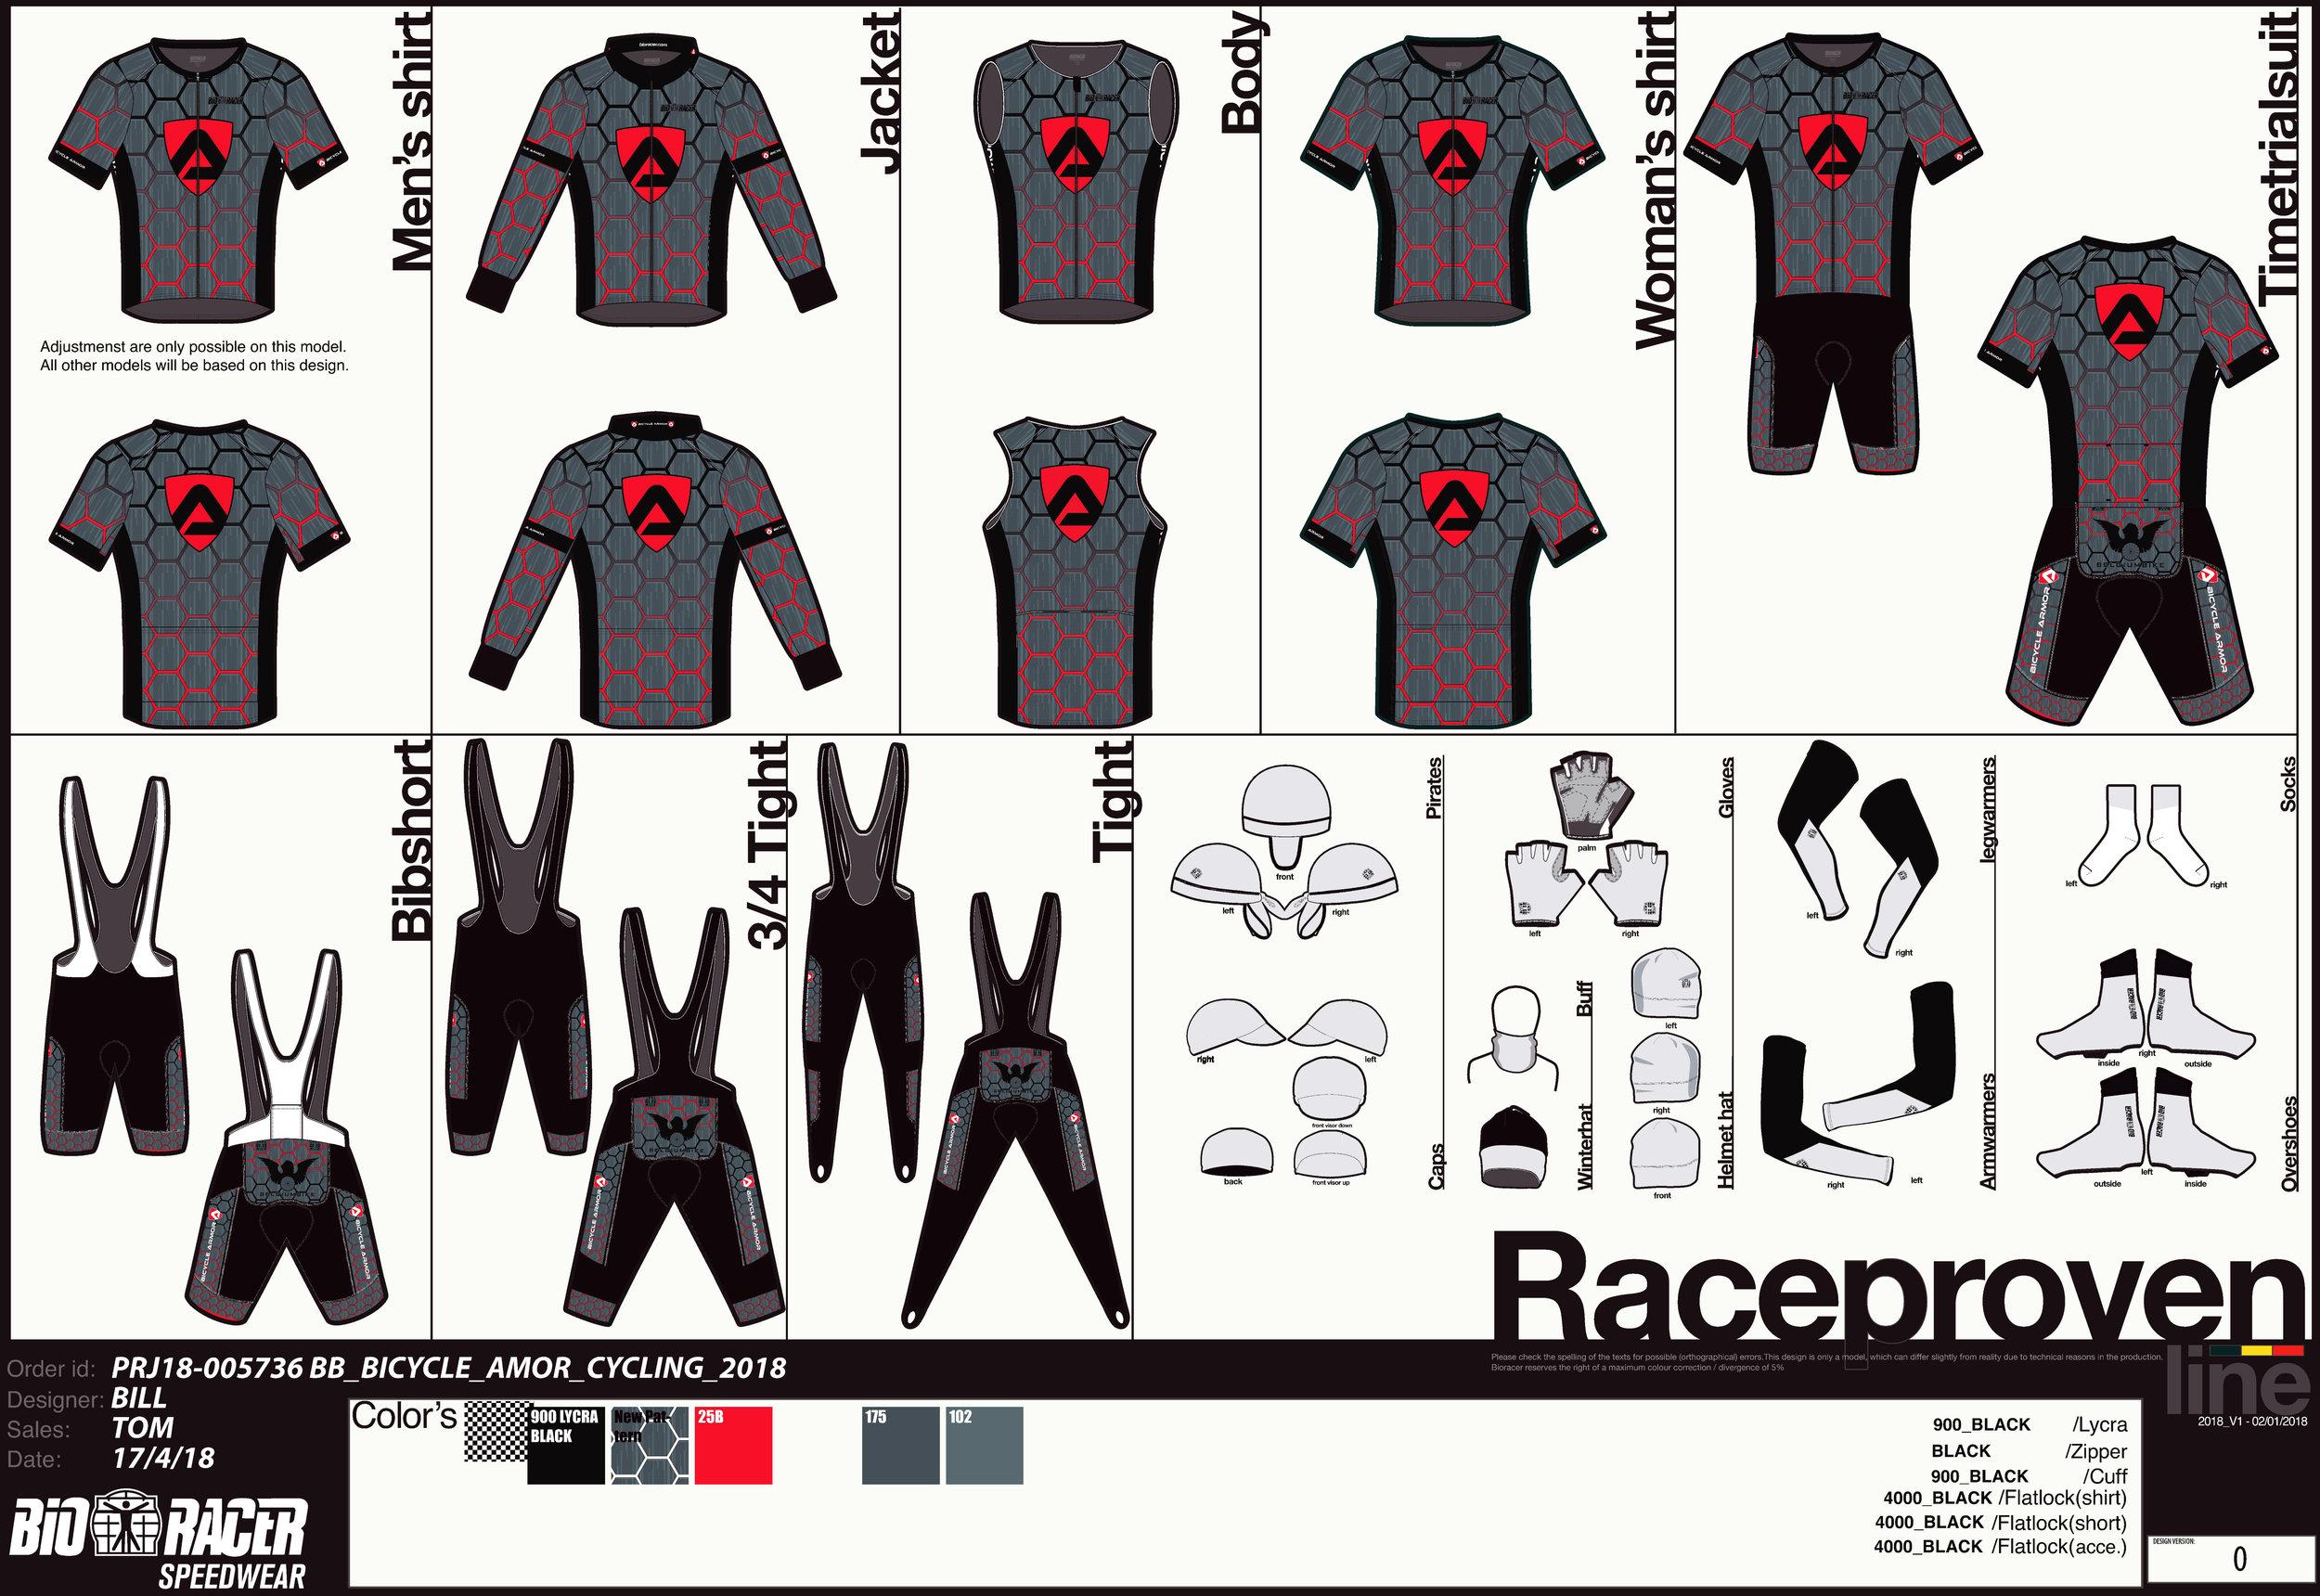 Bioracer raceproven body vest back.jpg